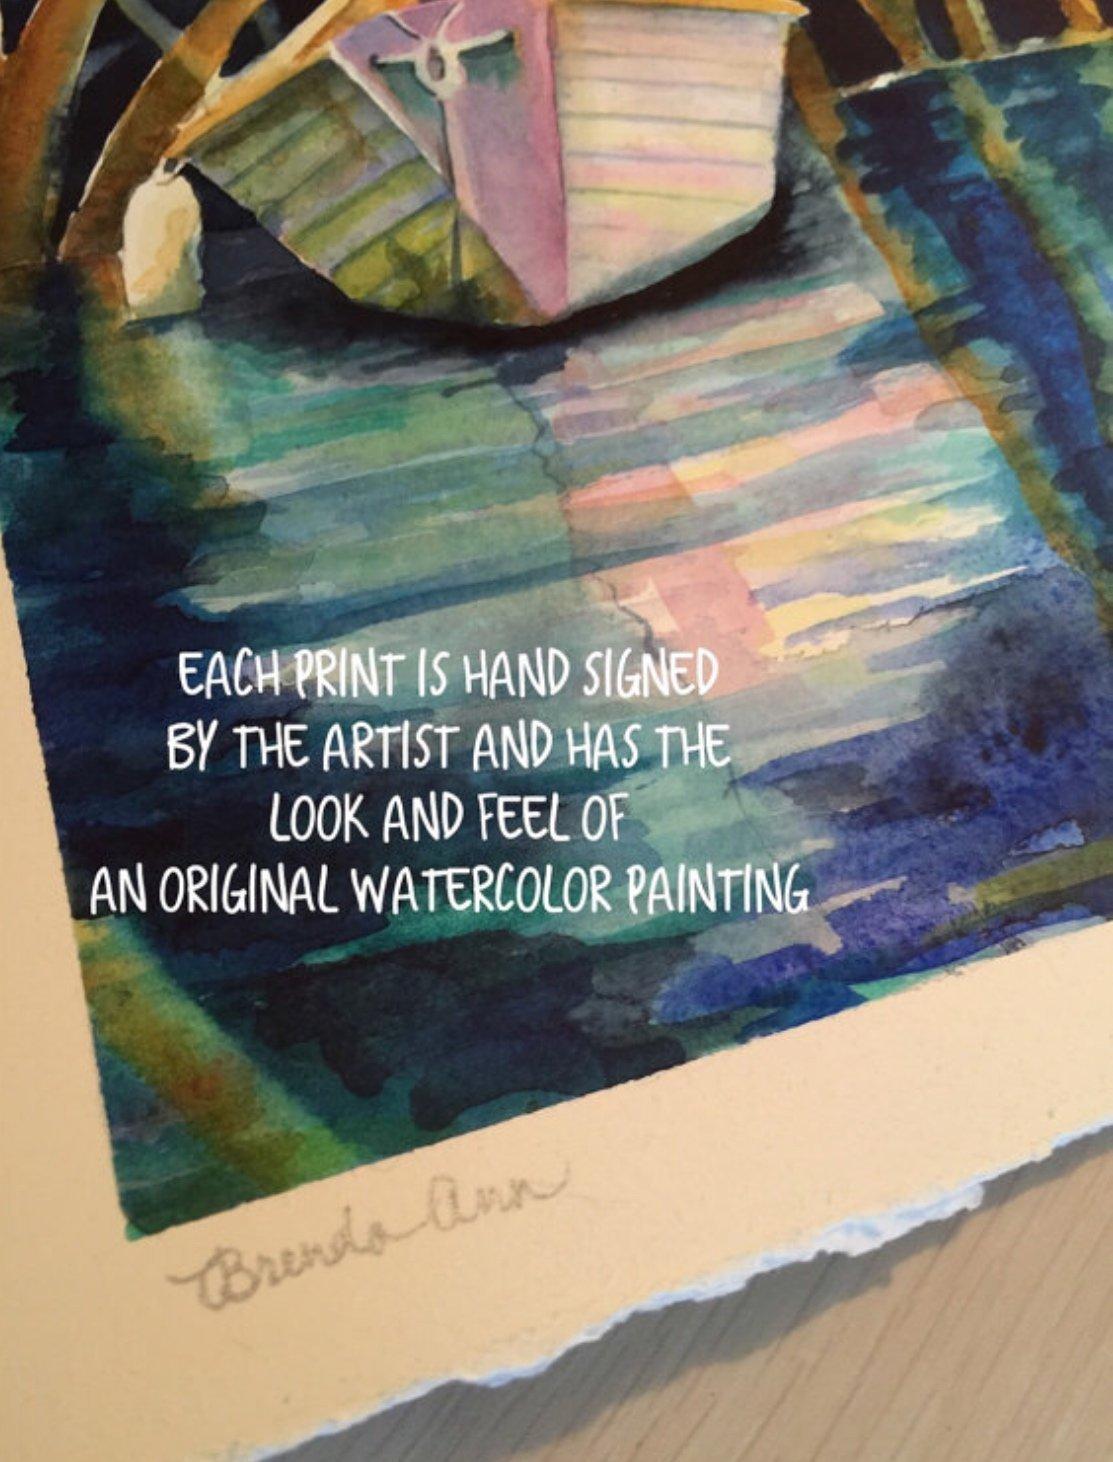 Watercolor artist magazine customer service - Amazon Com Hemingway House Key West Fine Art Wall Art Artwork Watercolor Art Print Handmade